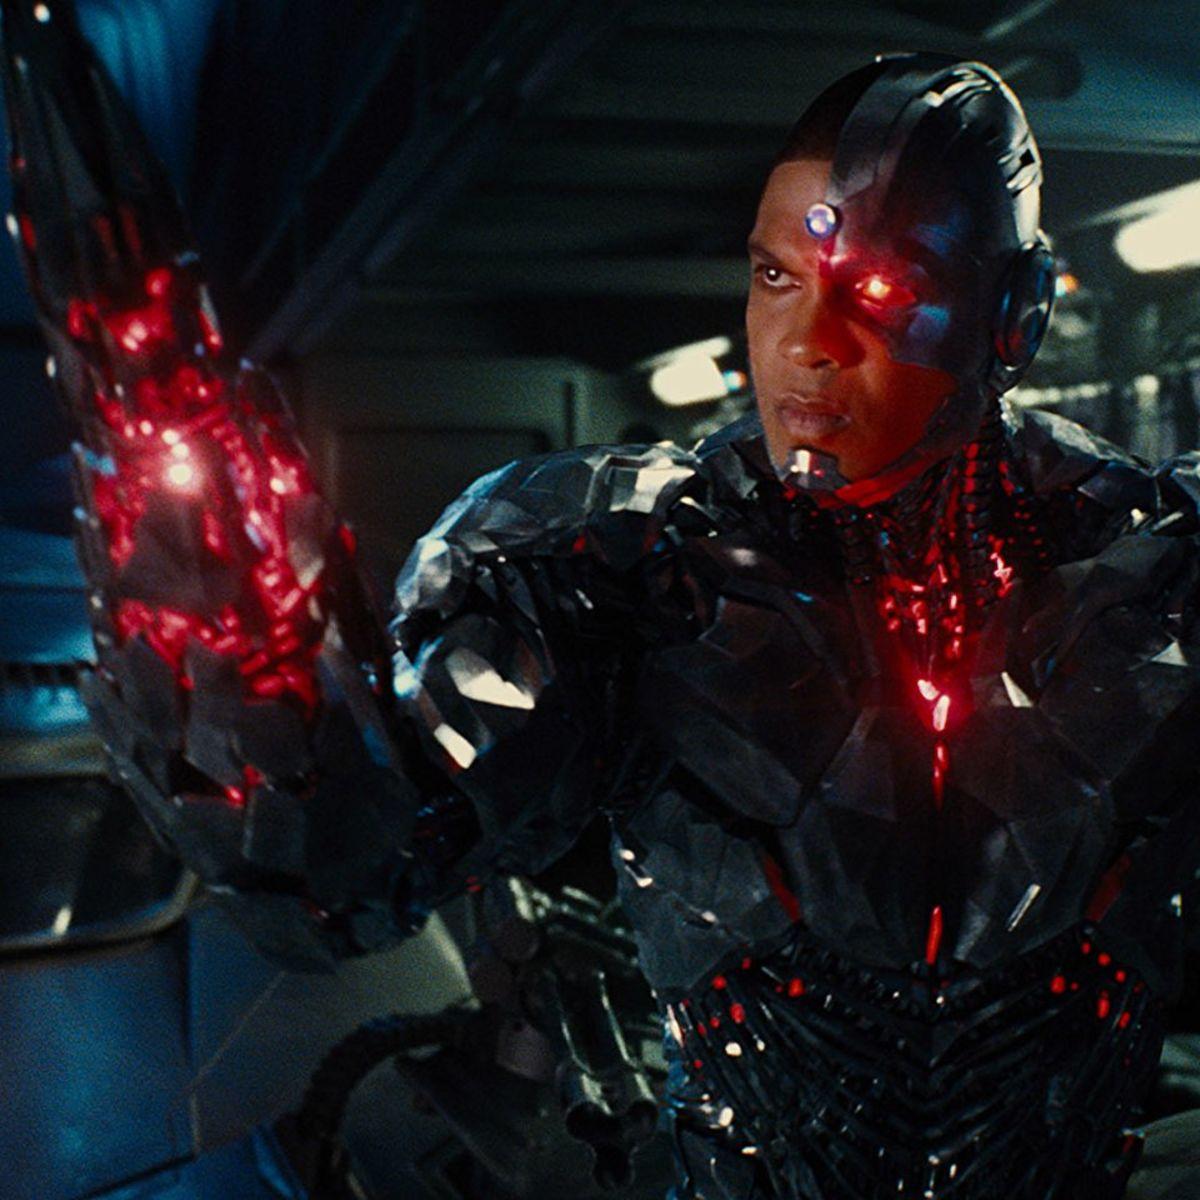 justice_league_cyborg_01.jpg